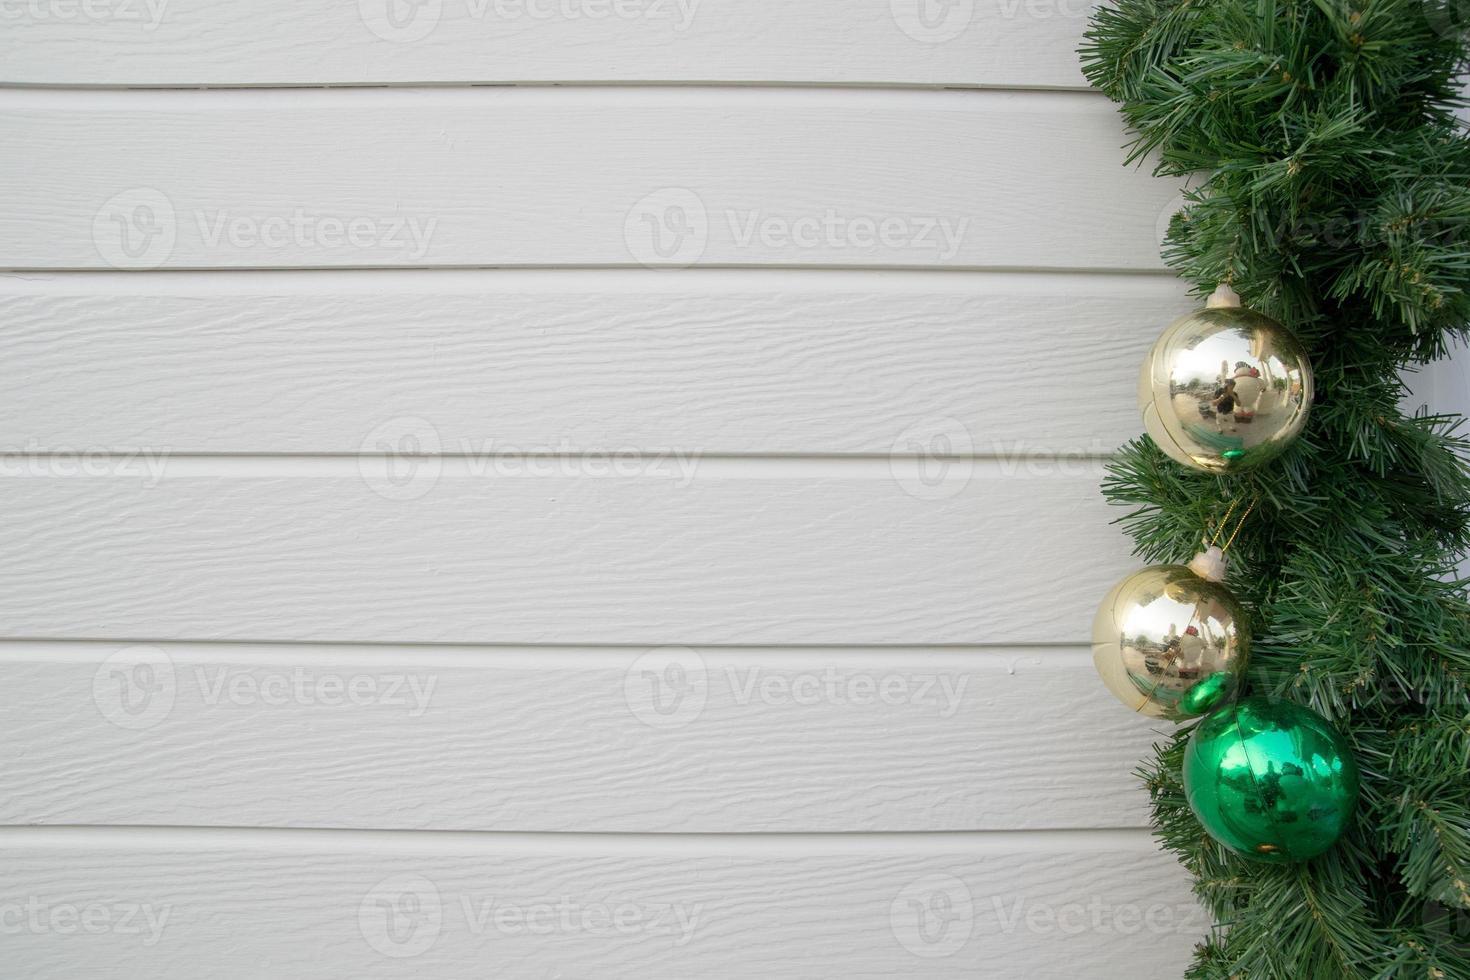 árbol de navidad decorado sobre fondo de pared de madera foto